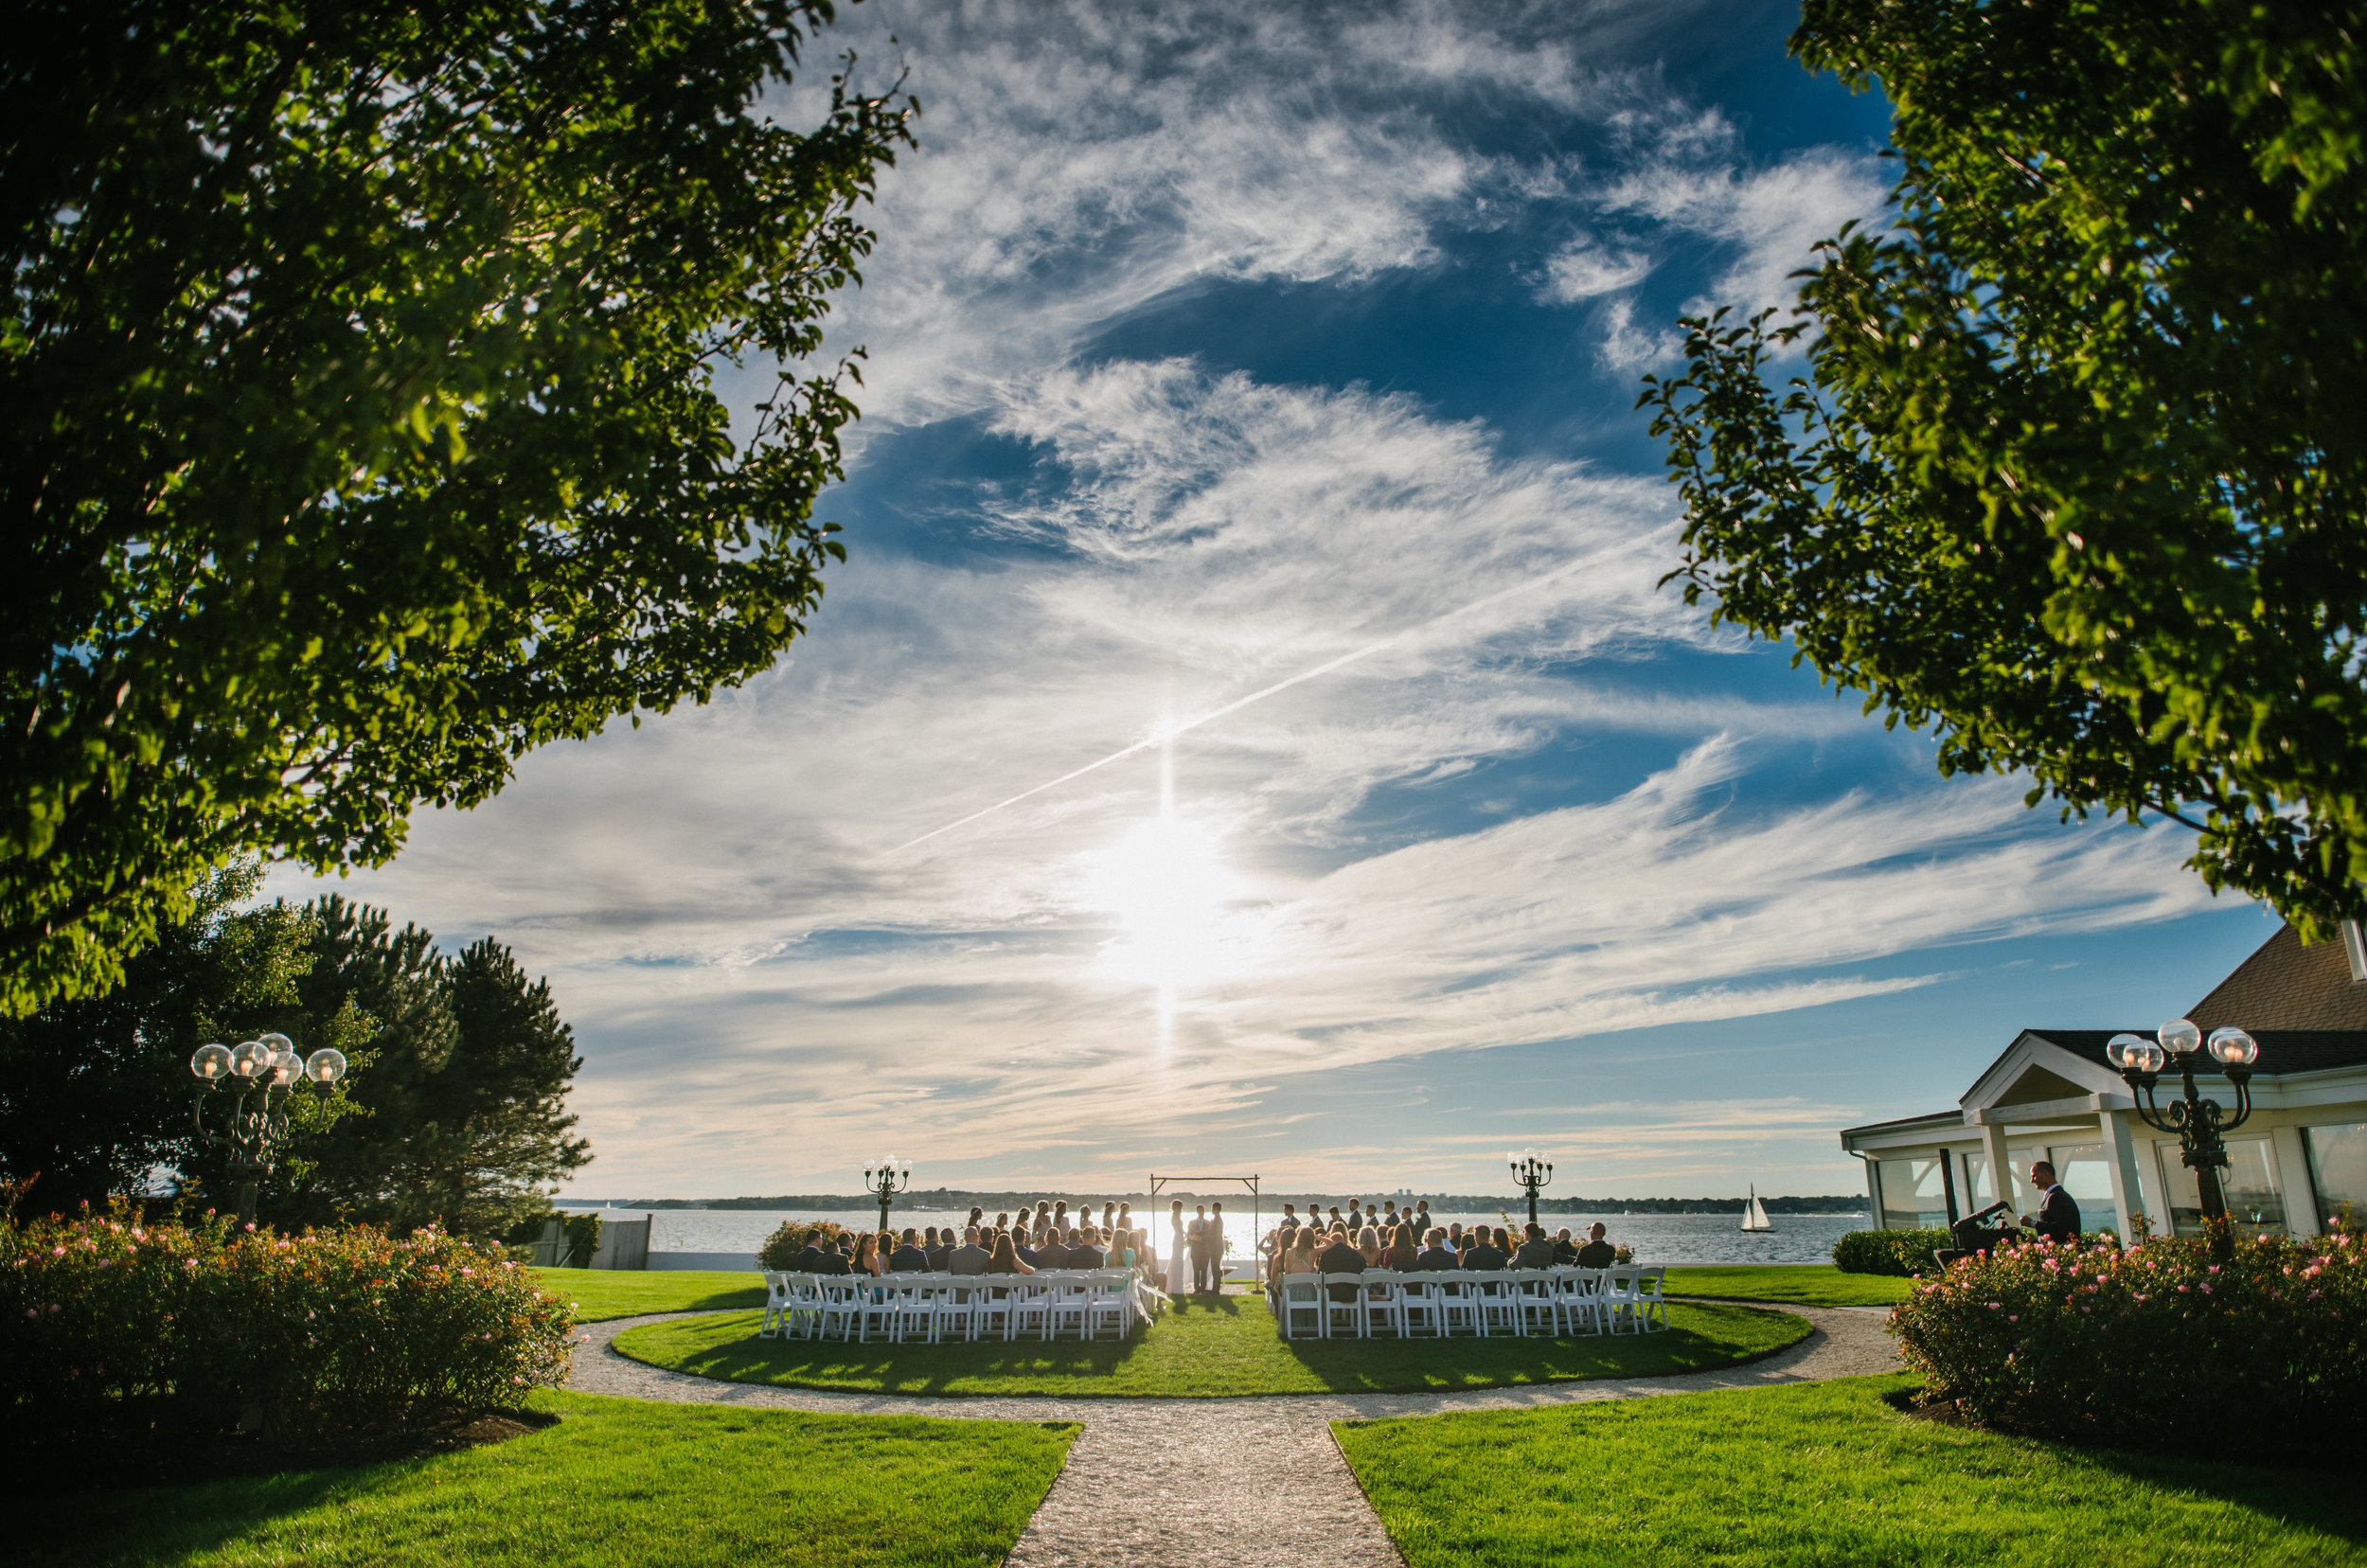 Nicolette&Brad|Wedding|RhodeIsland|Sep11,2016|Highlights-0148.jpg